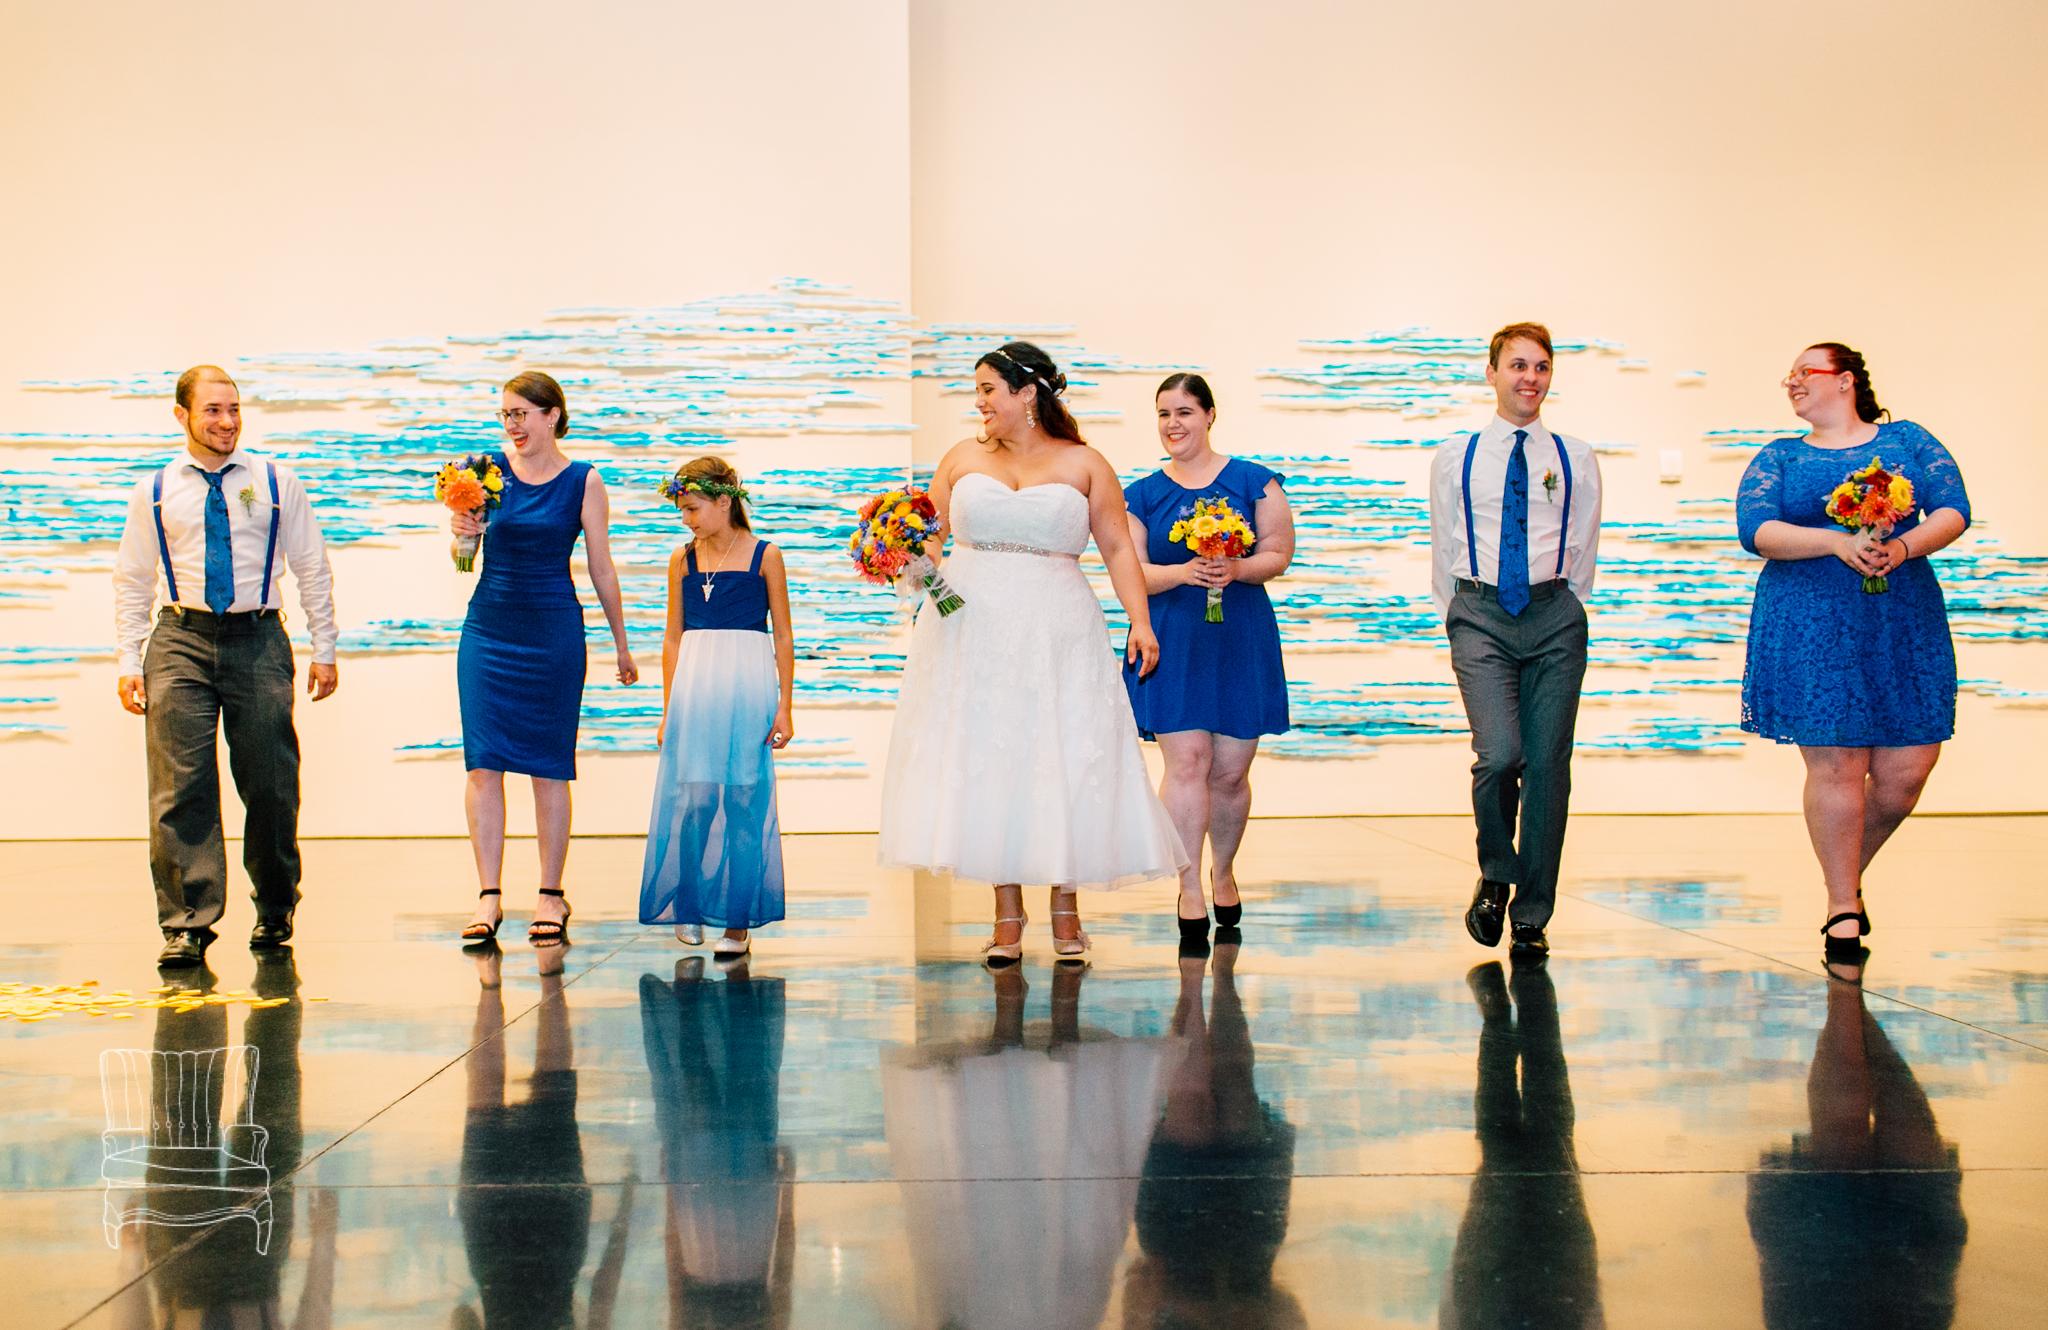 whatcom-museum-wedding-bribran-2.jpg